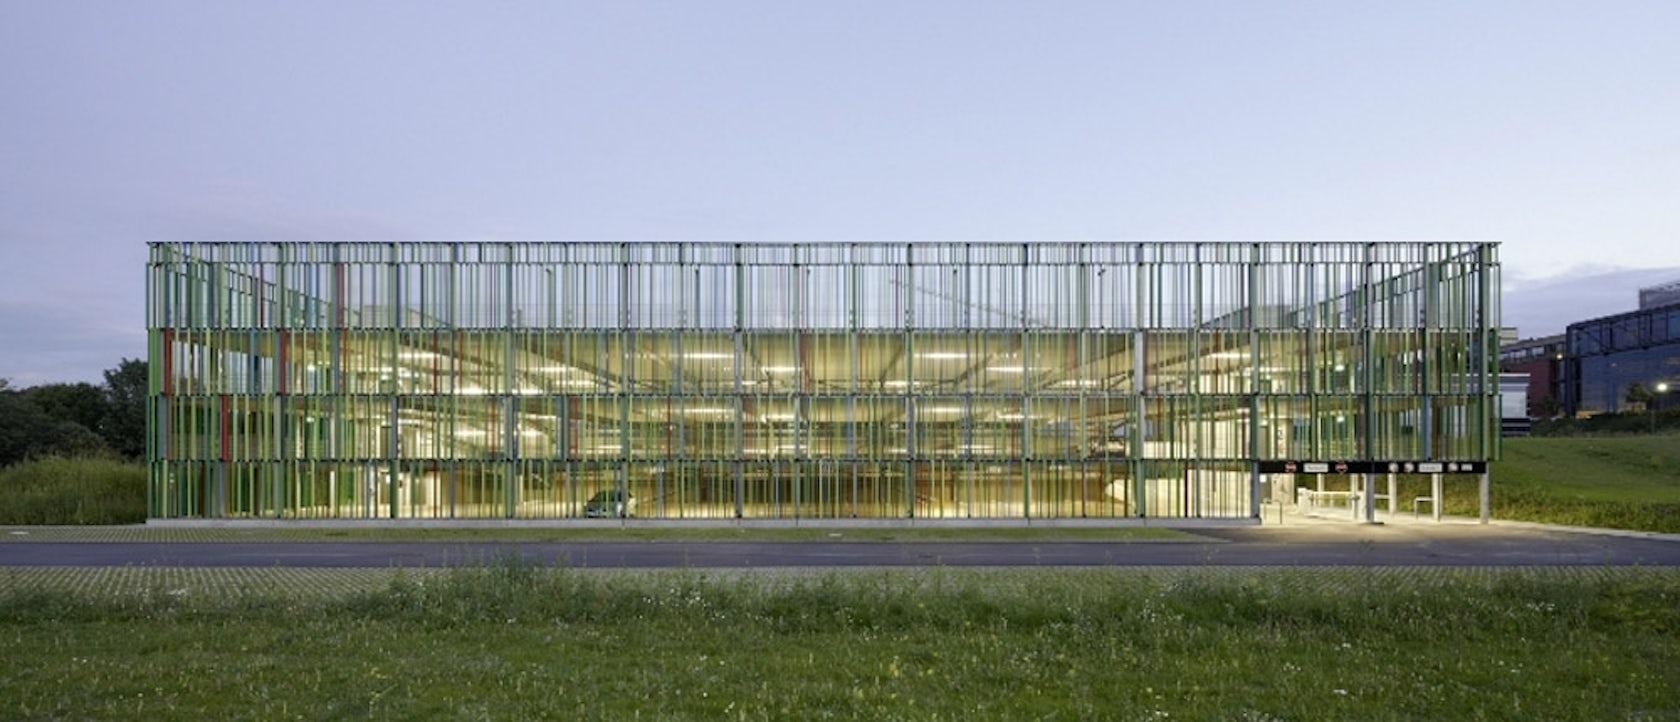 Multi Storey Car Park Of Fraunhofer Ilt And Ipt Aachen